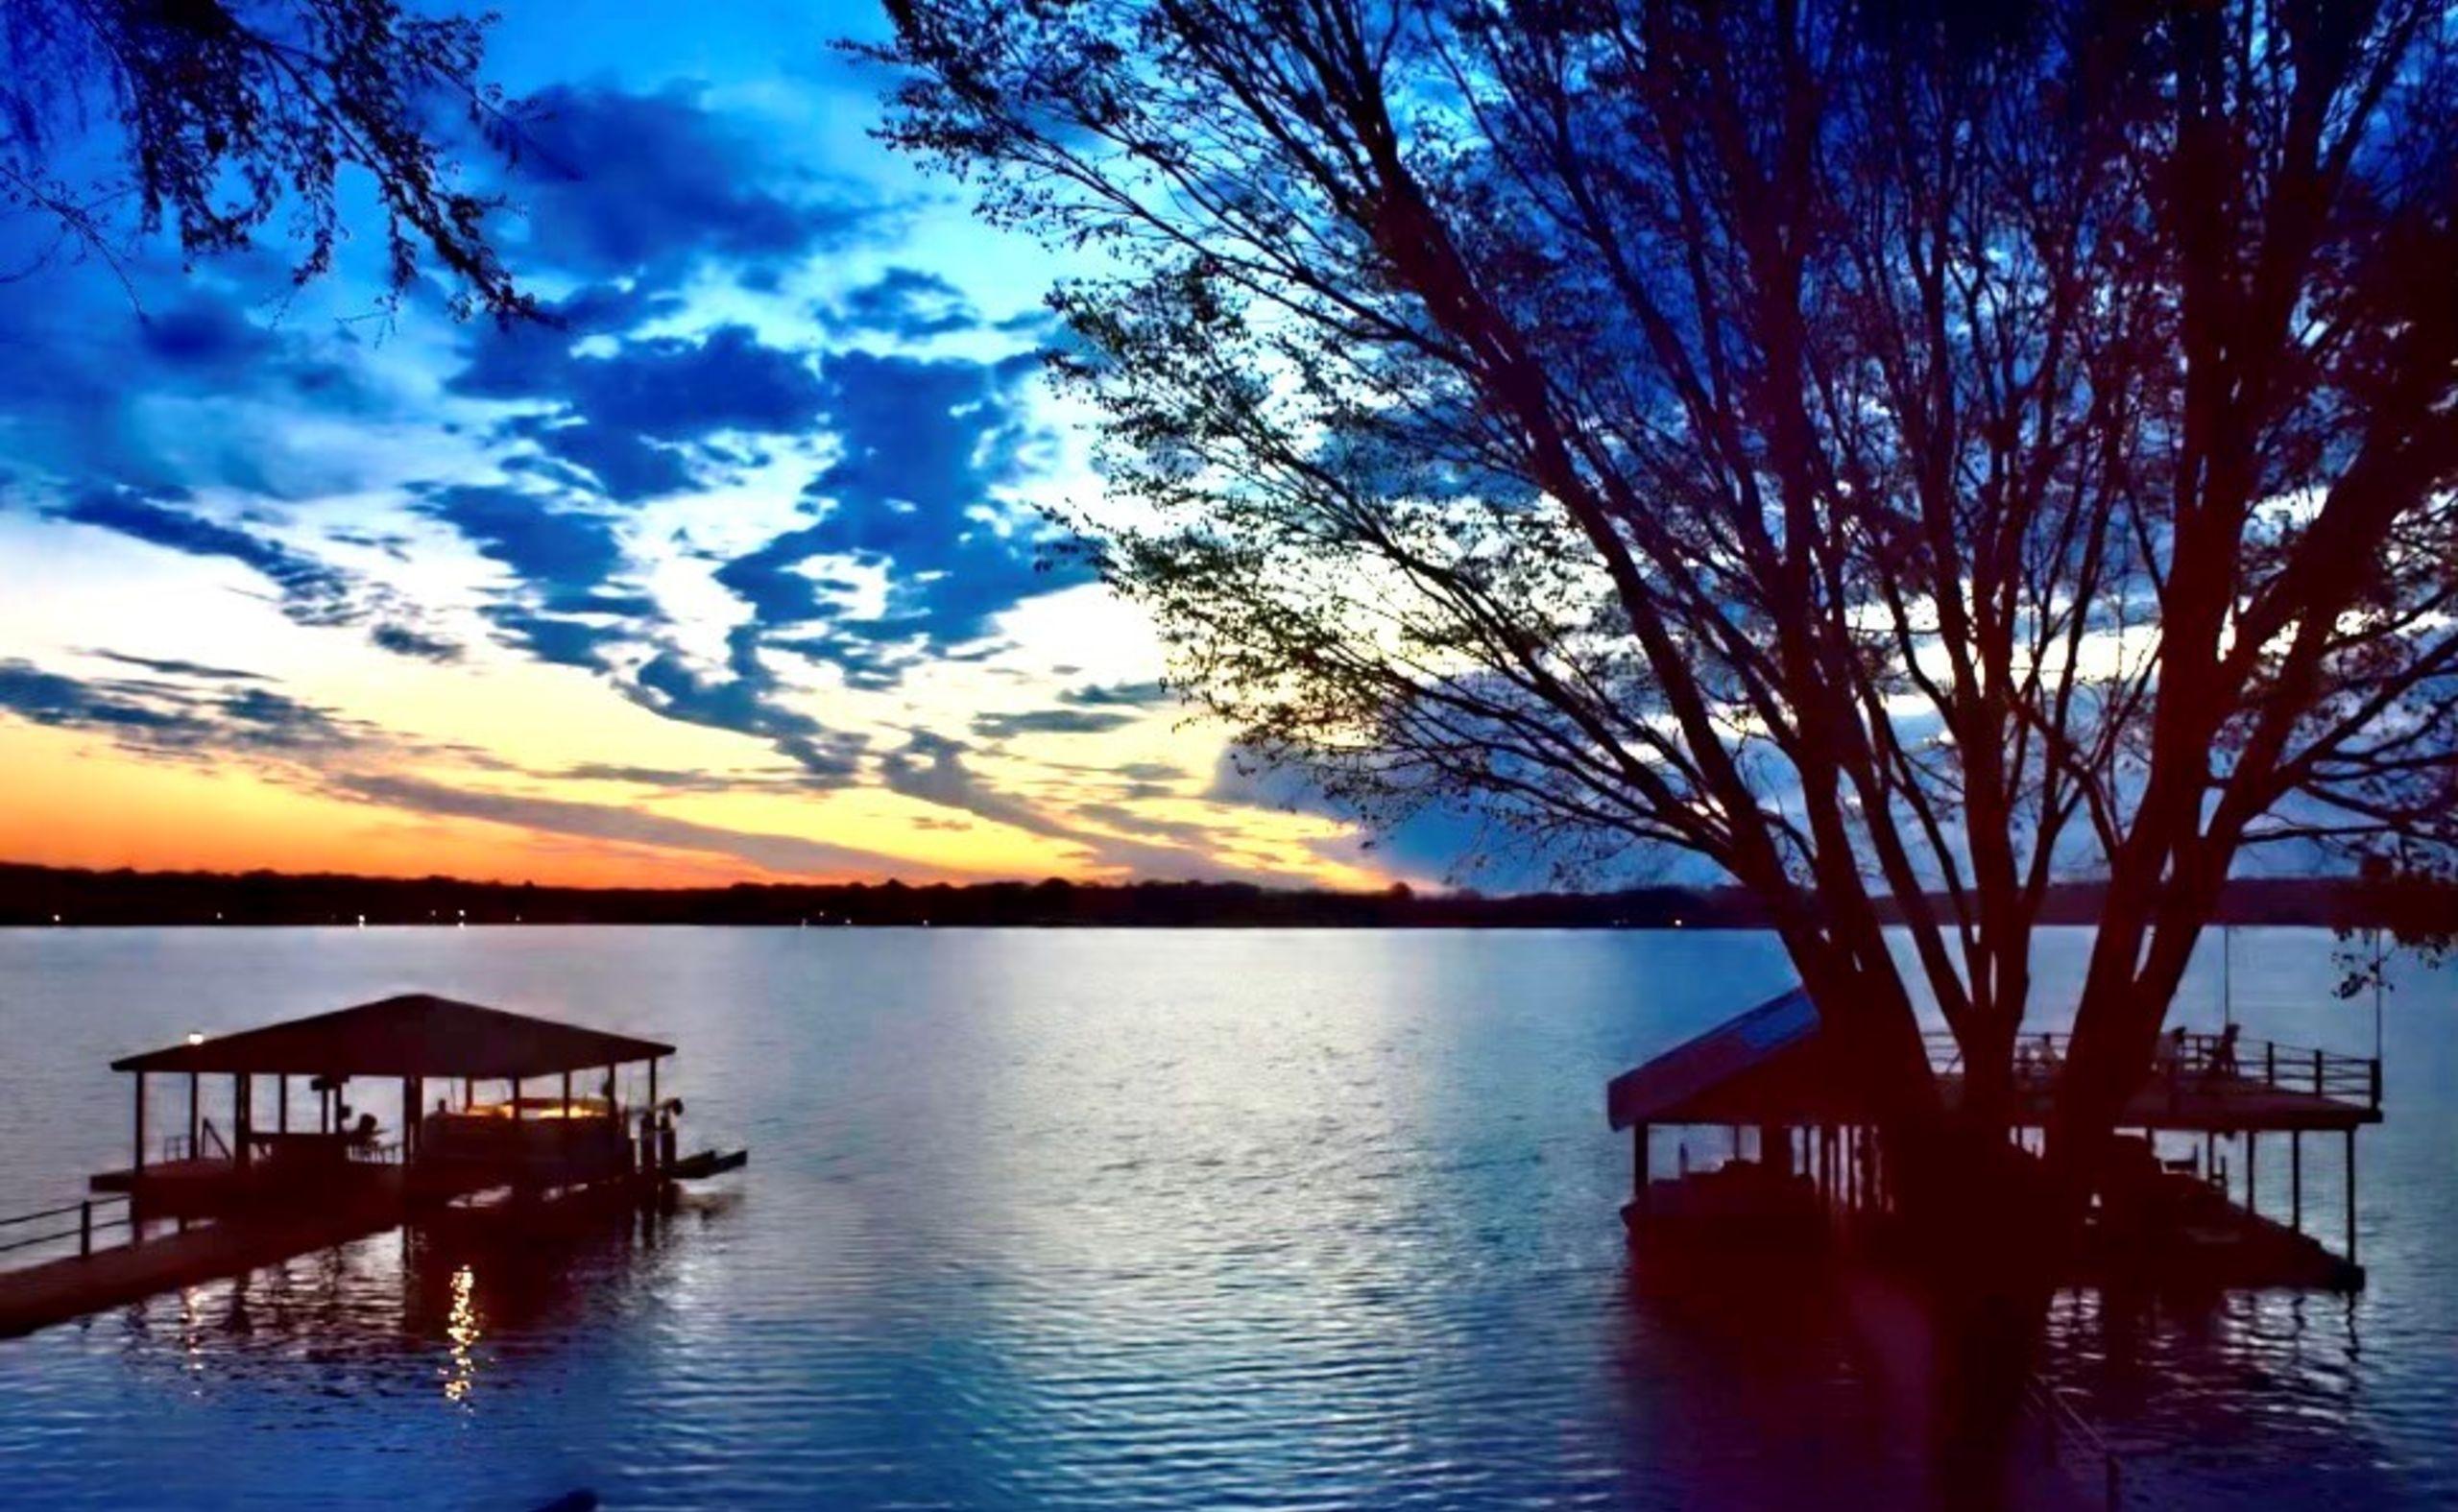 cedar Creek Lake Picture